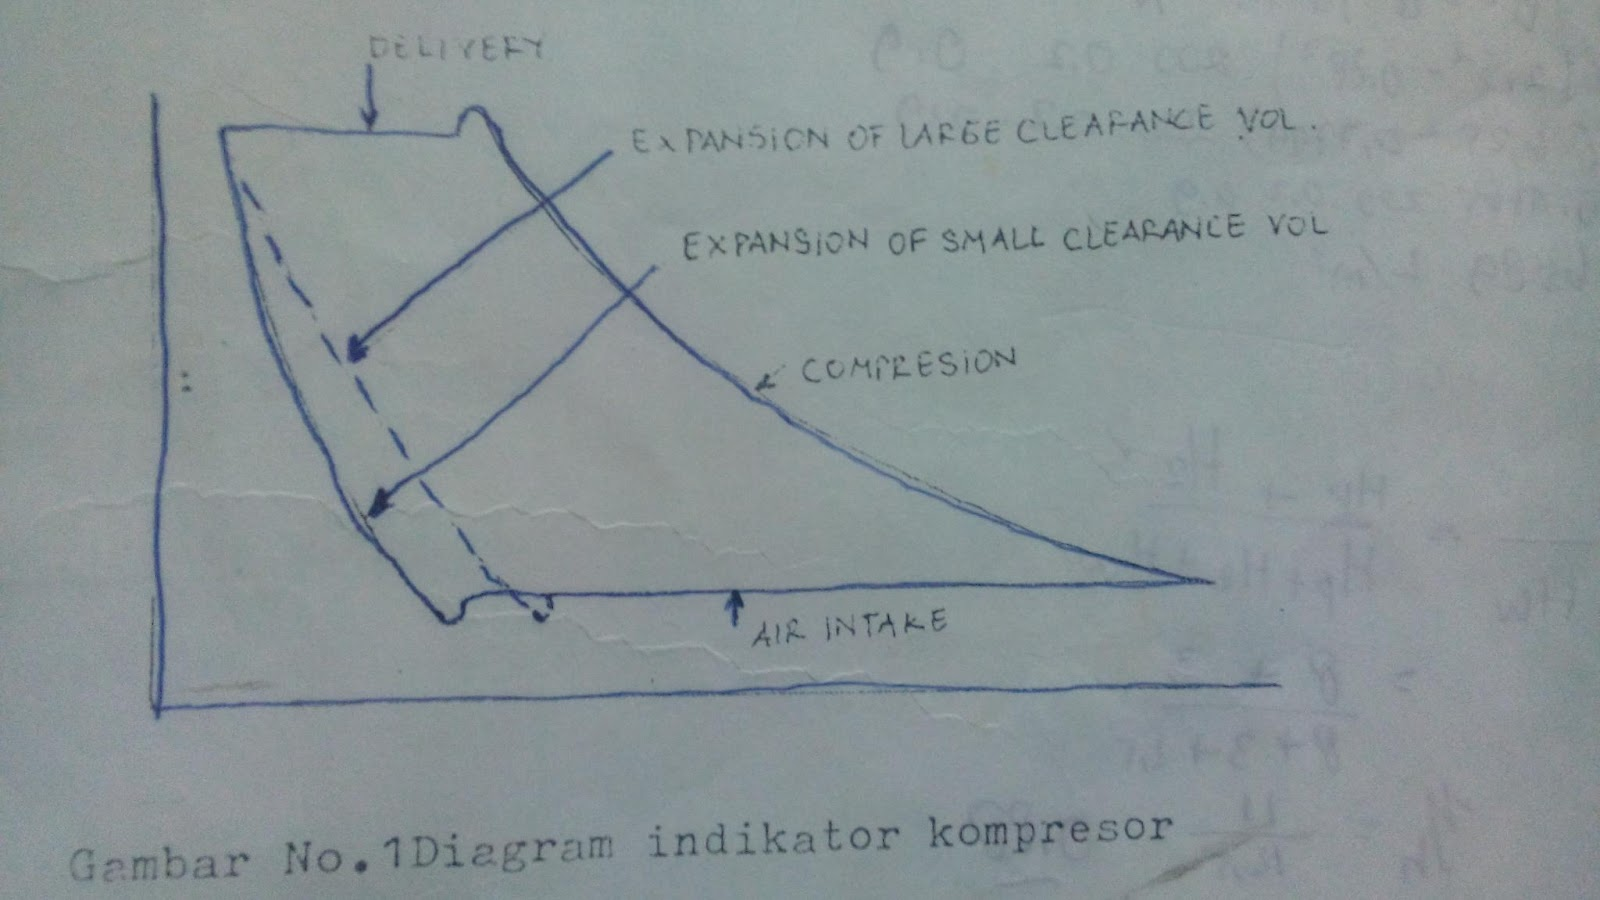 Ujian keahlian pelaut att iv kompresor udara gambar no1 diagram indikator komprsor ccuart Image collections